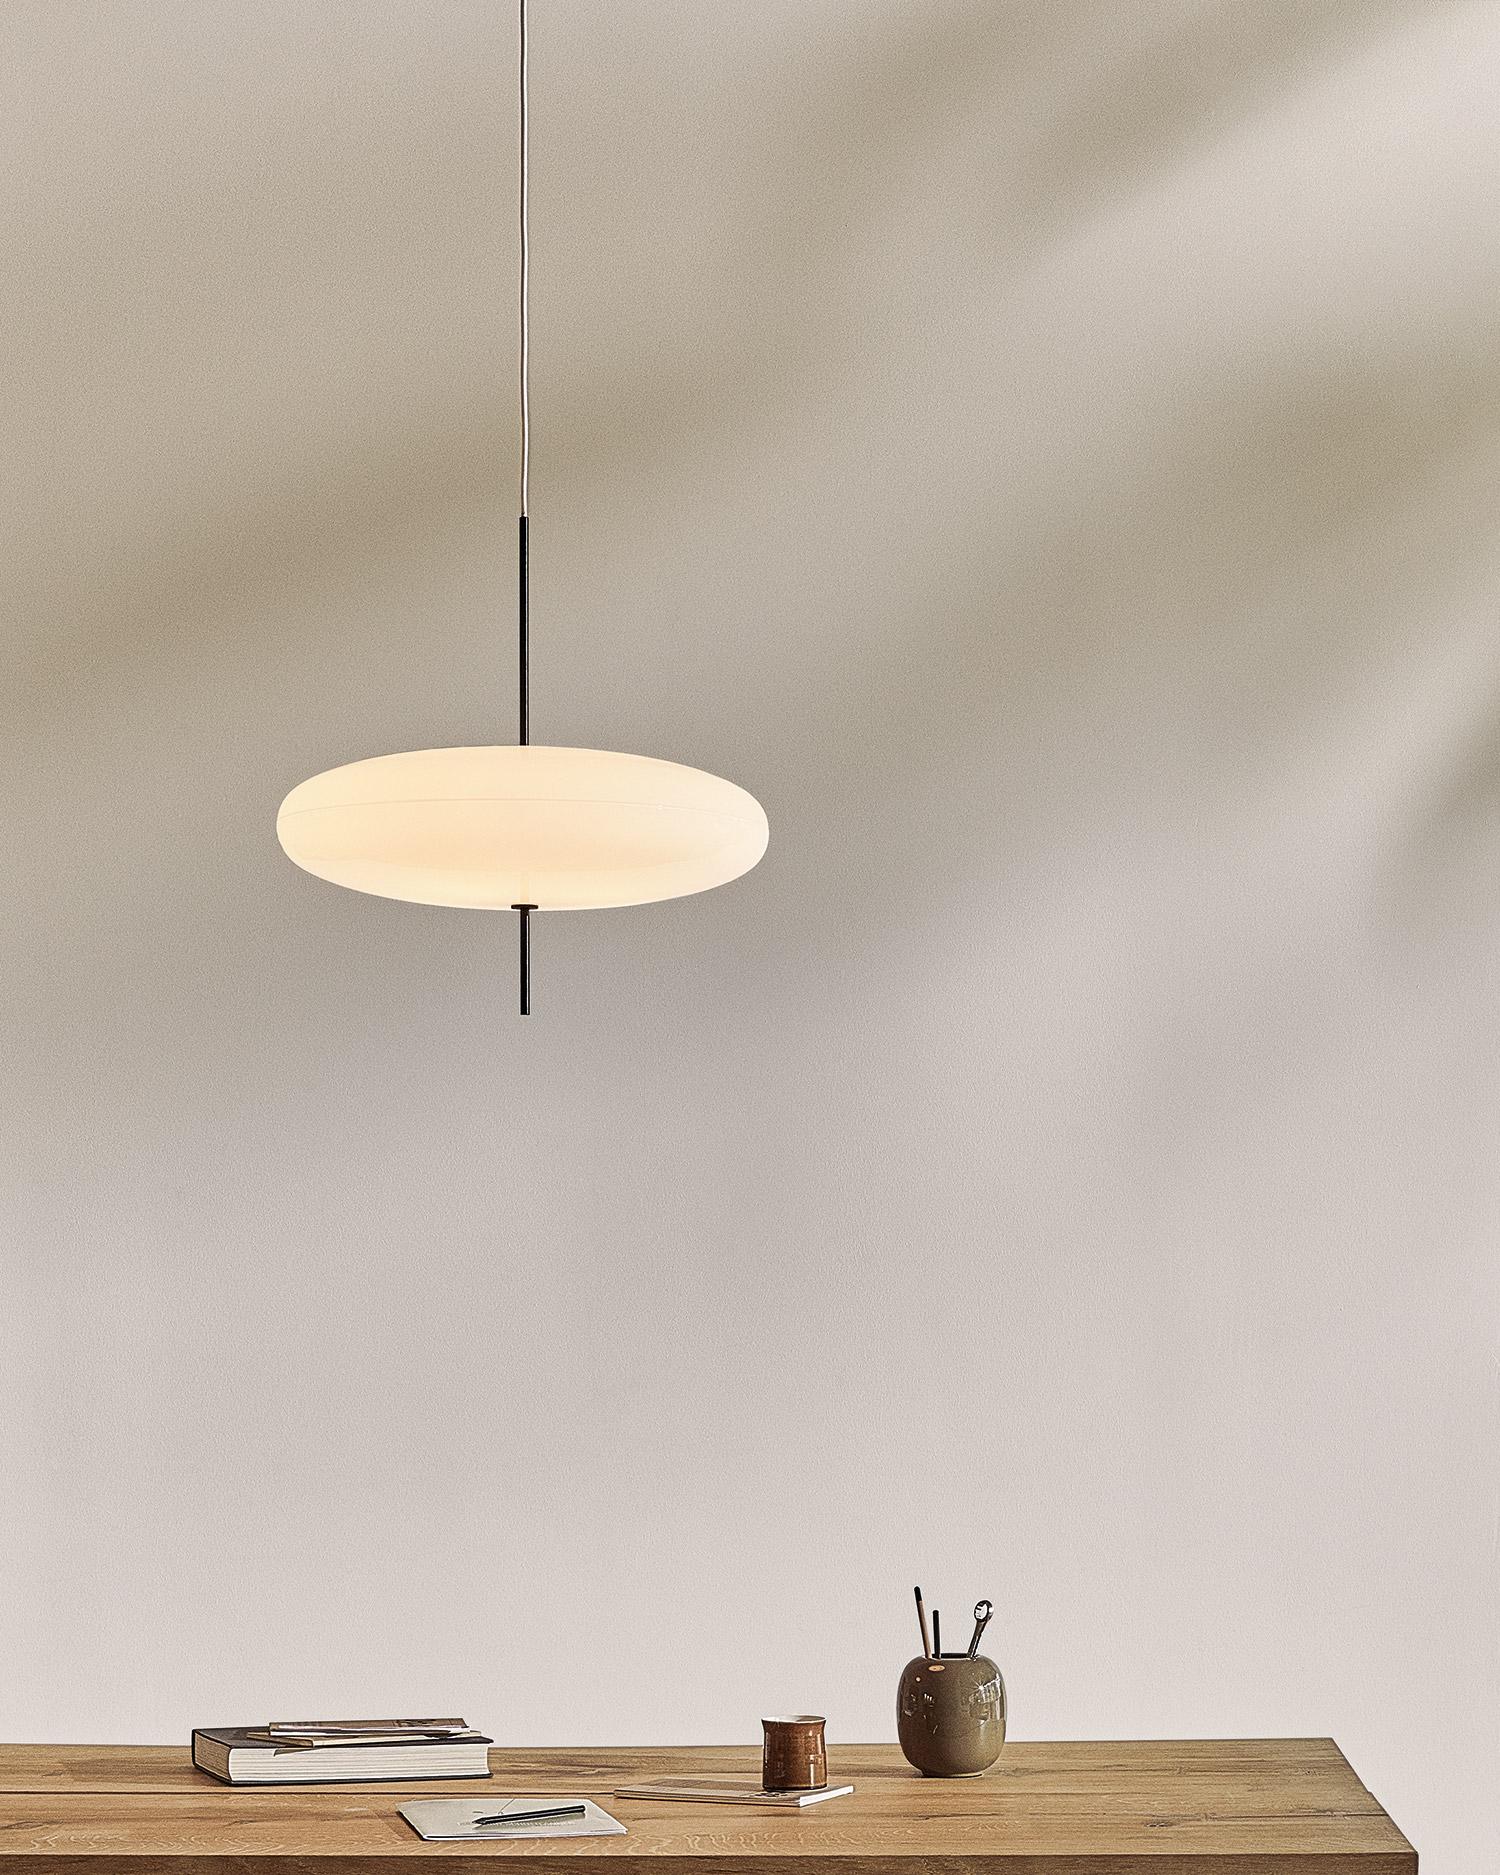 modern minimal pendant light over a wooden desk